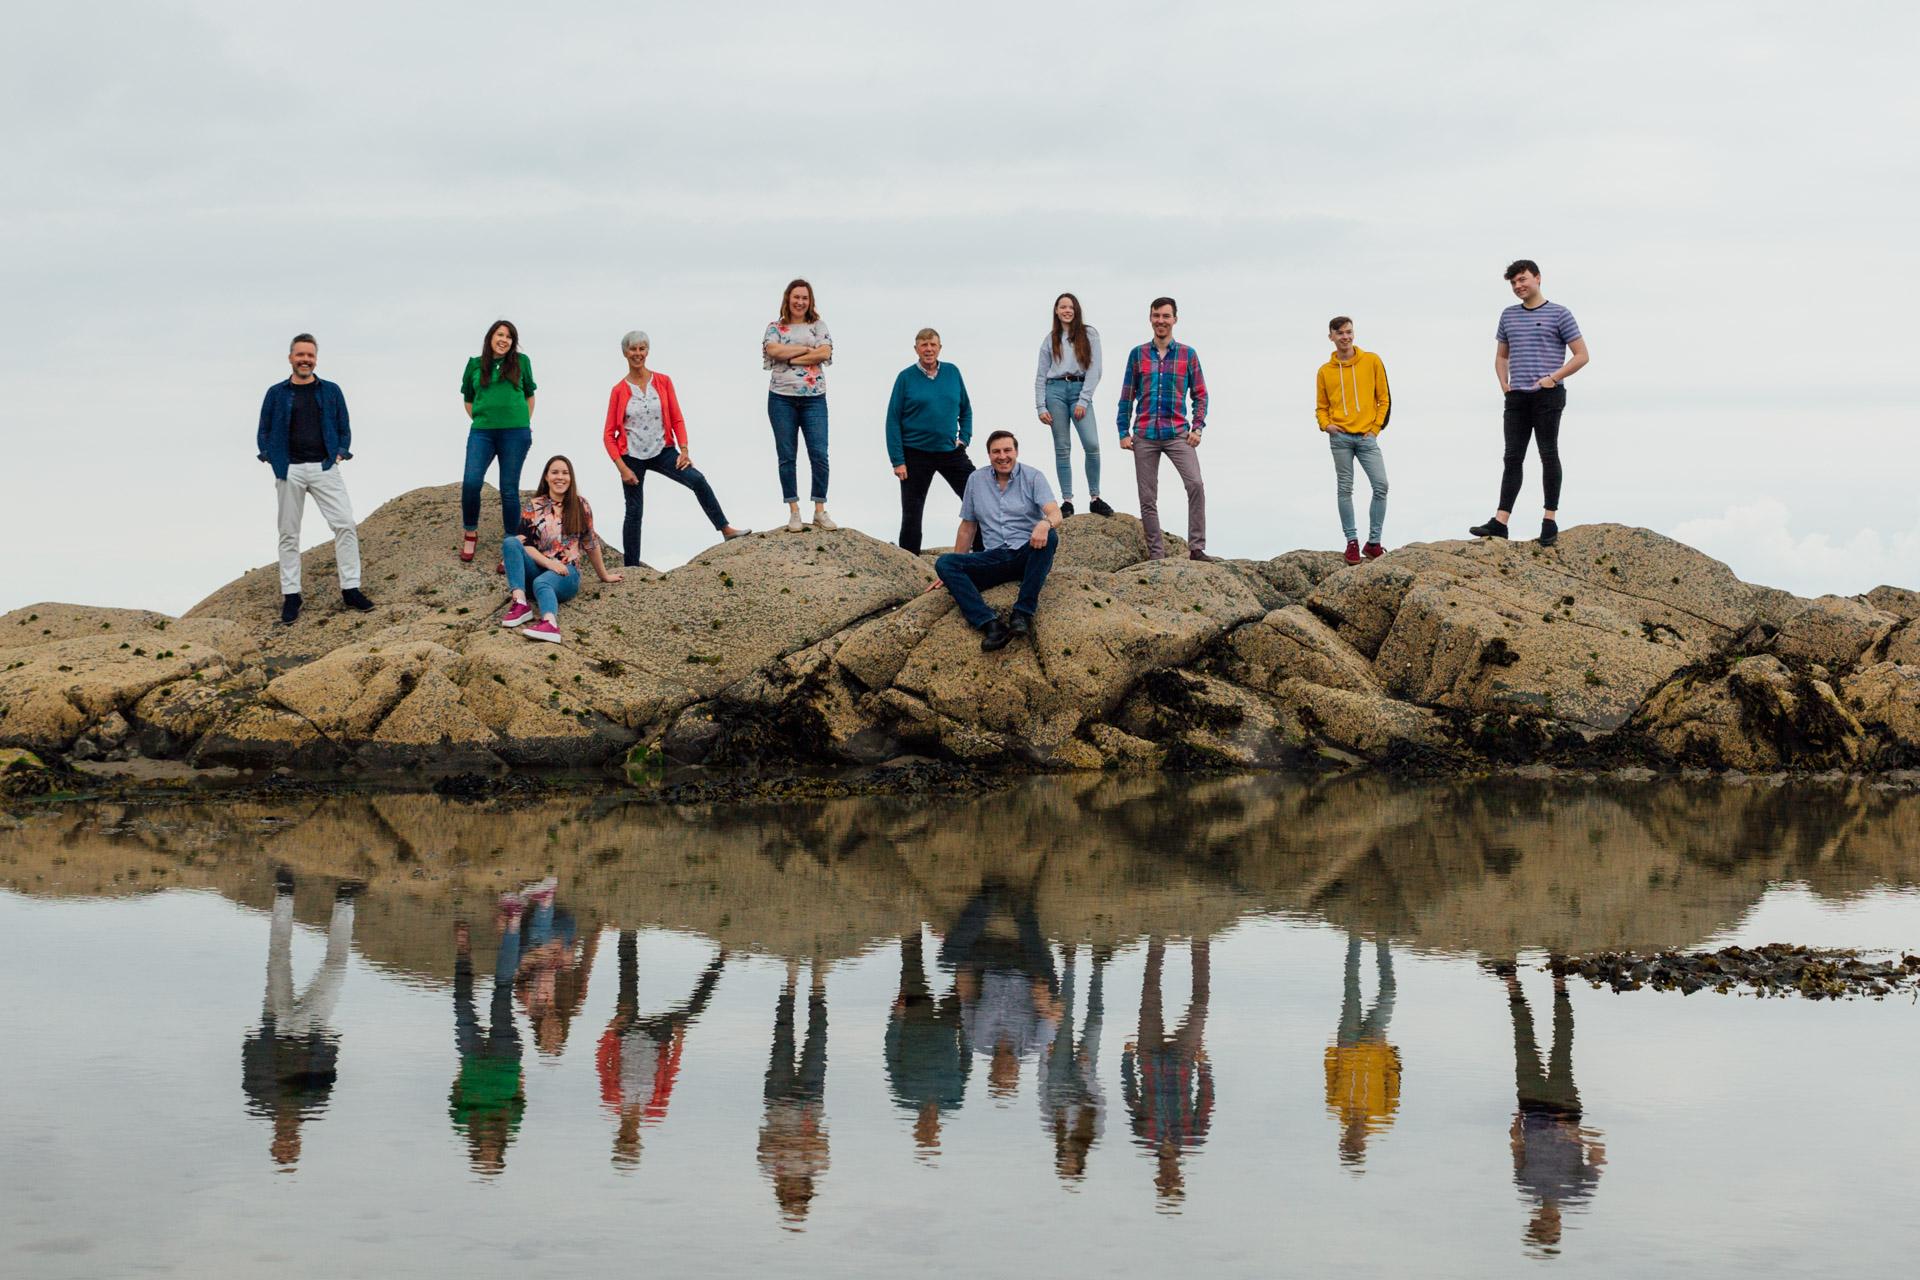 Family Photography Bangor by Ricky Parker Photography 1 1